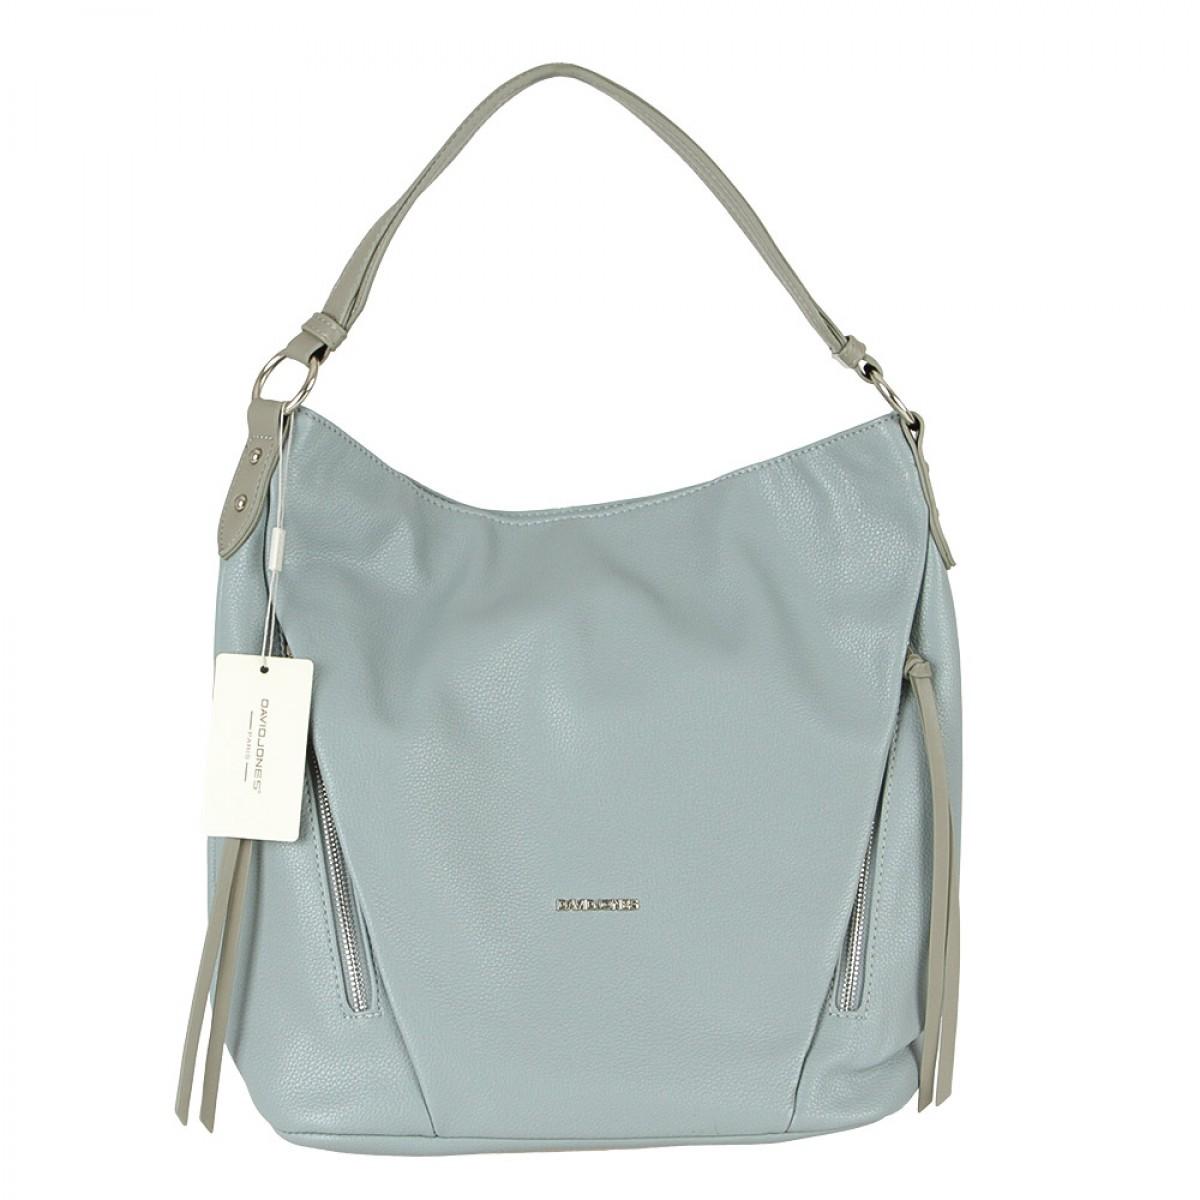 Жіноча сумка David Jones  6218-2 PALE BLUE